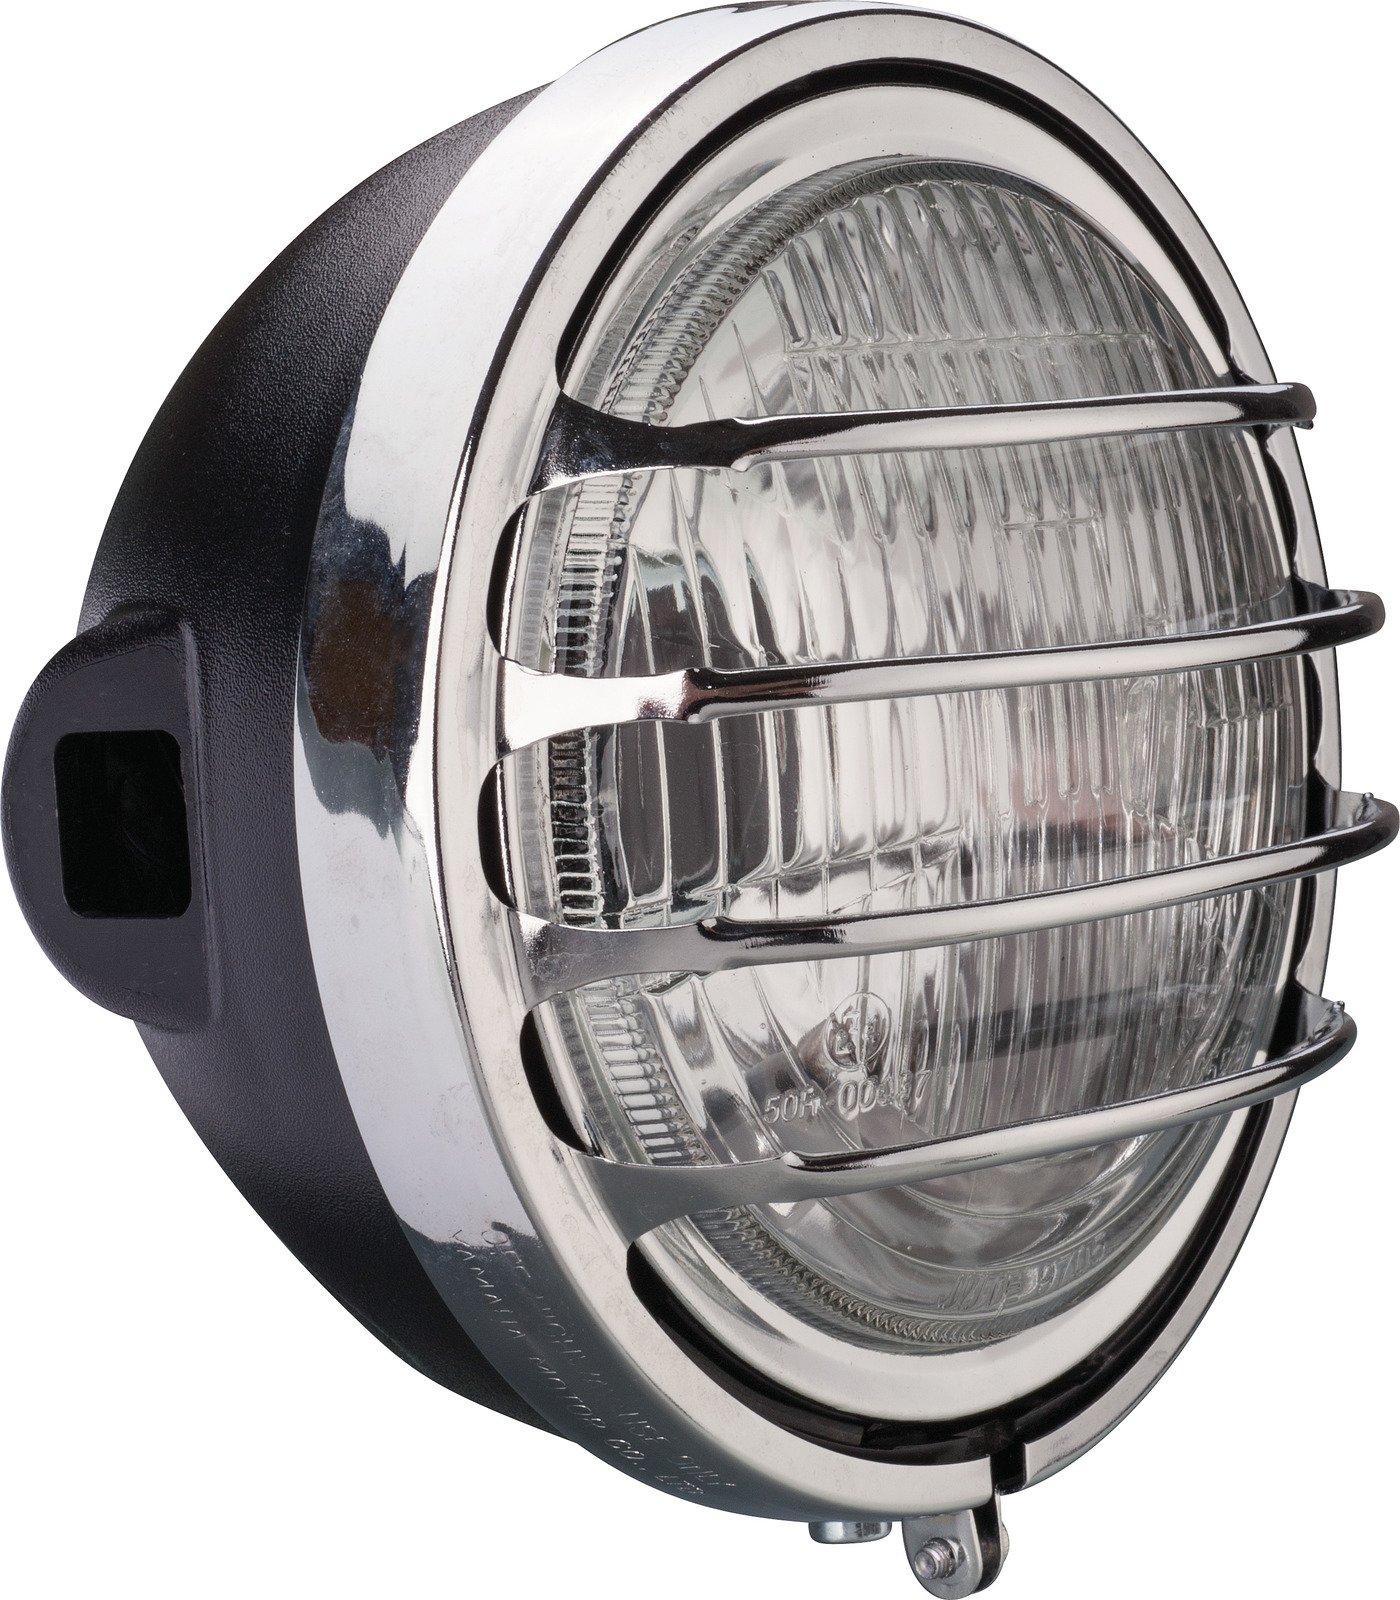 hight resolution of yamaha xt500 tt500 paris dakar replica headlight lamp kit h4 bulb 12v or 6v a 046